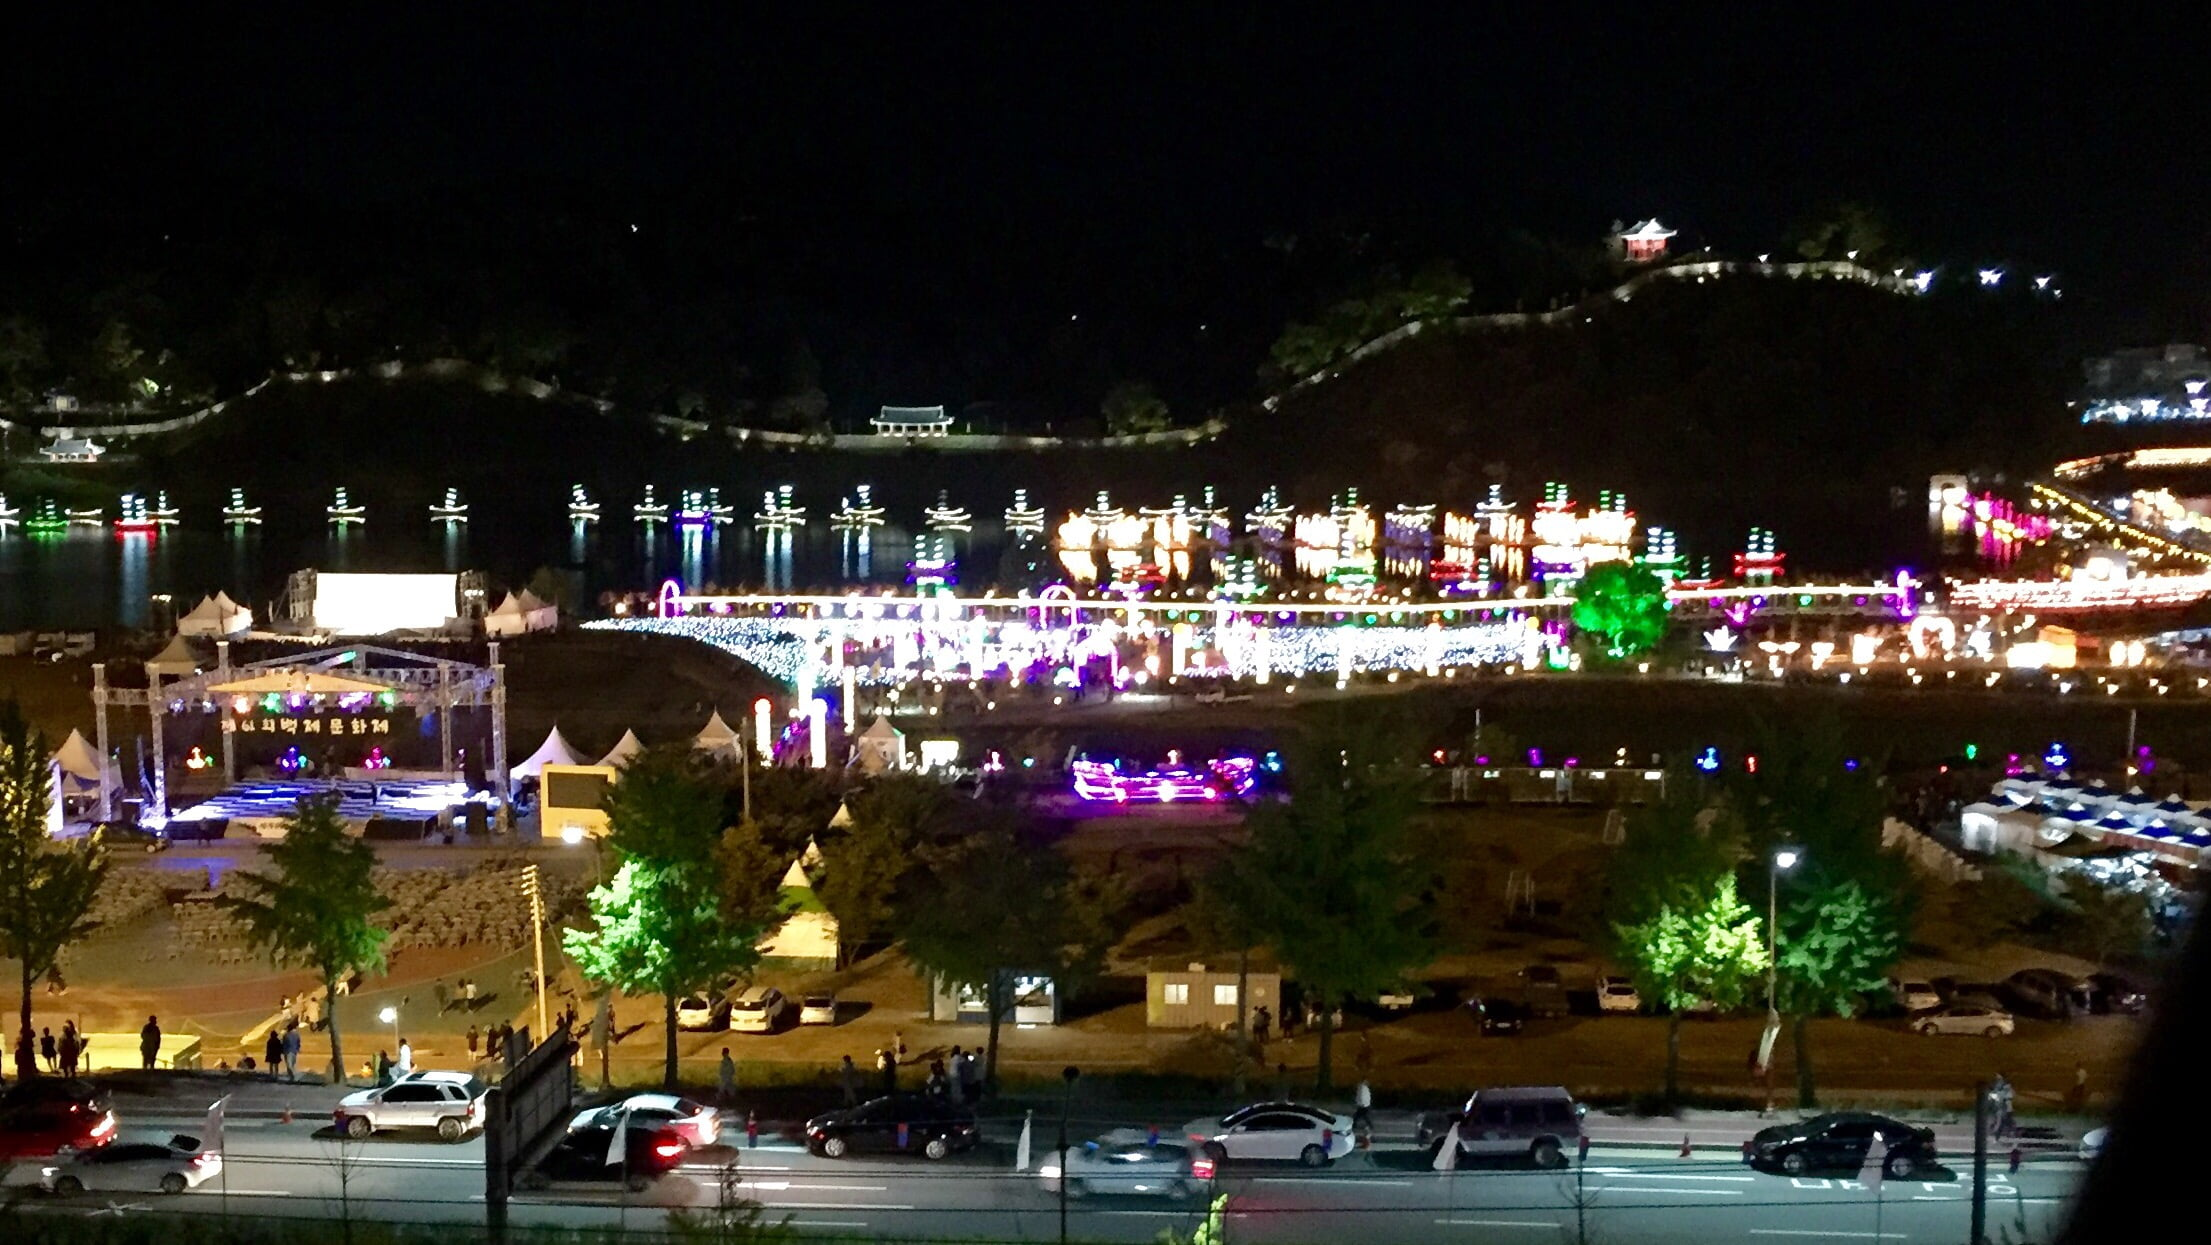 Het Baekje festivalterrein, gezien vanuit ons hotel